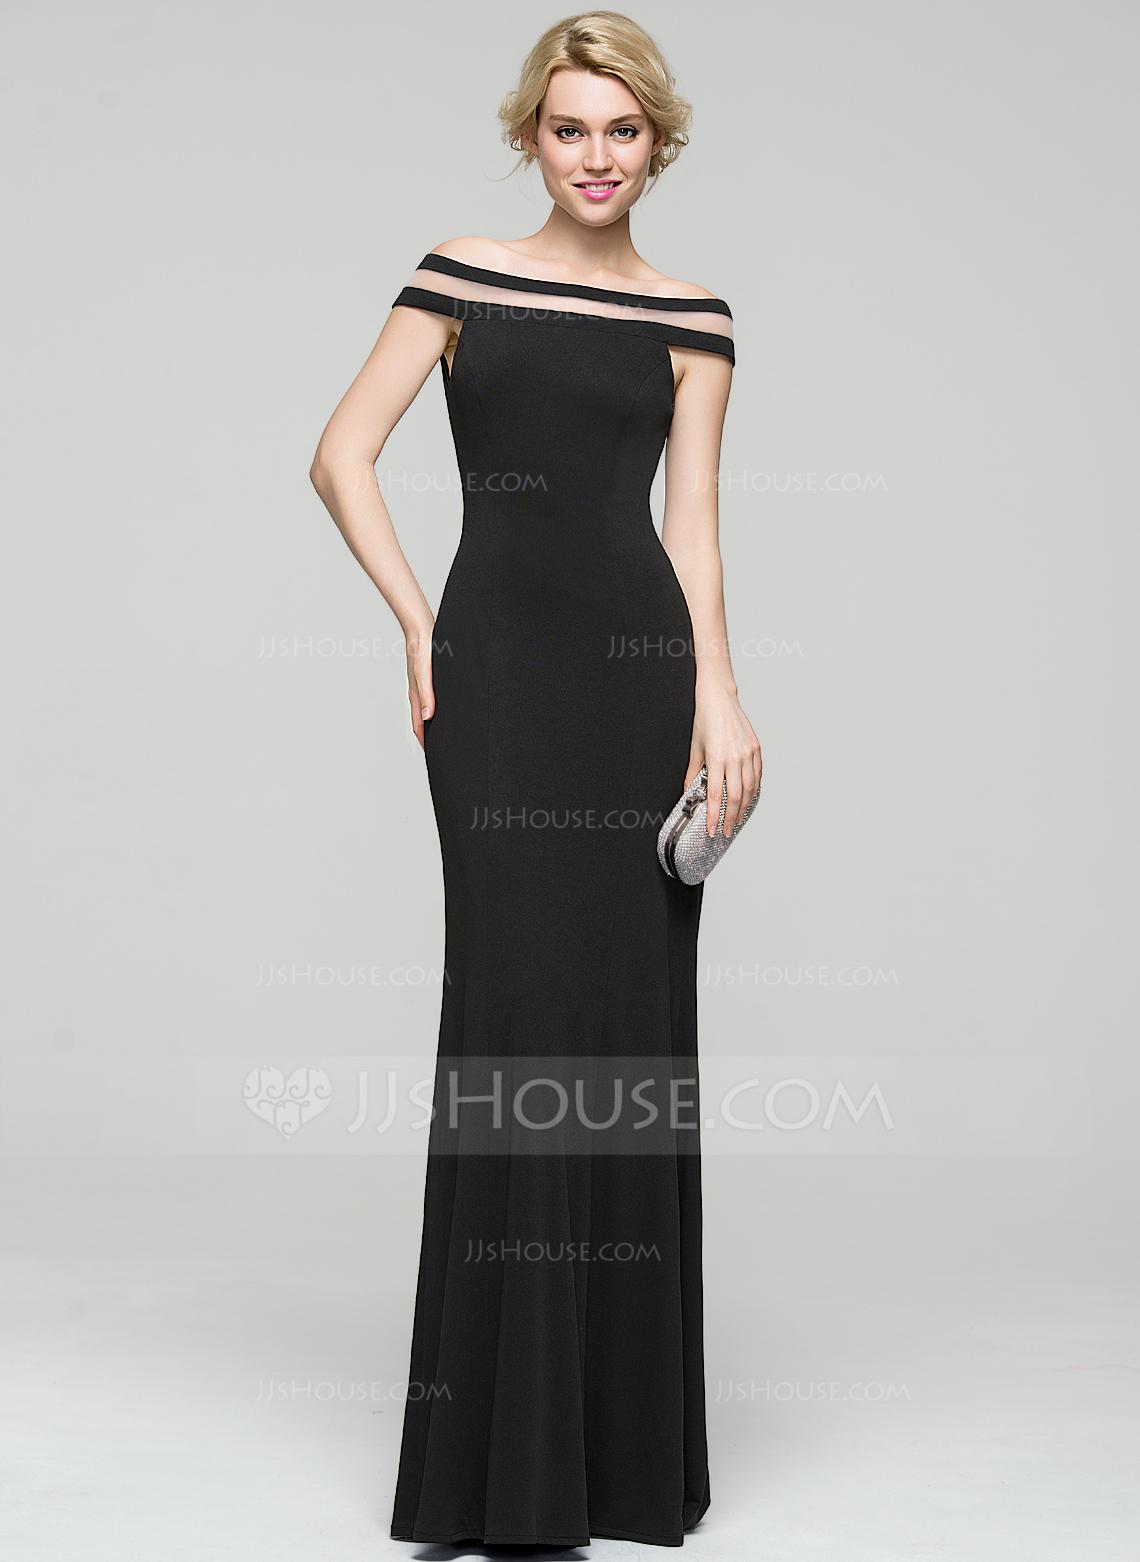 jjshouse evening dress photo - 1